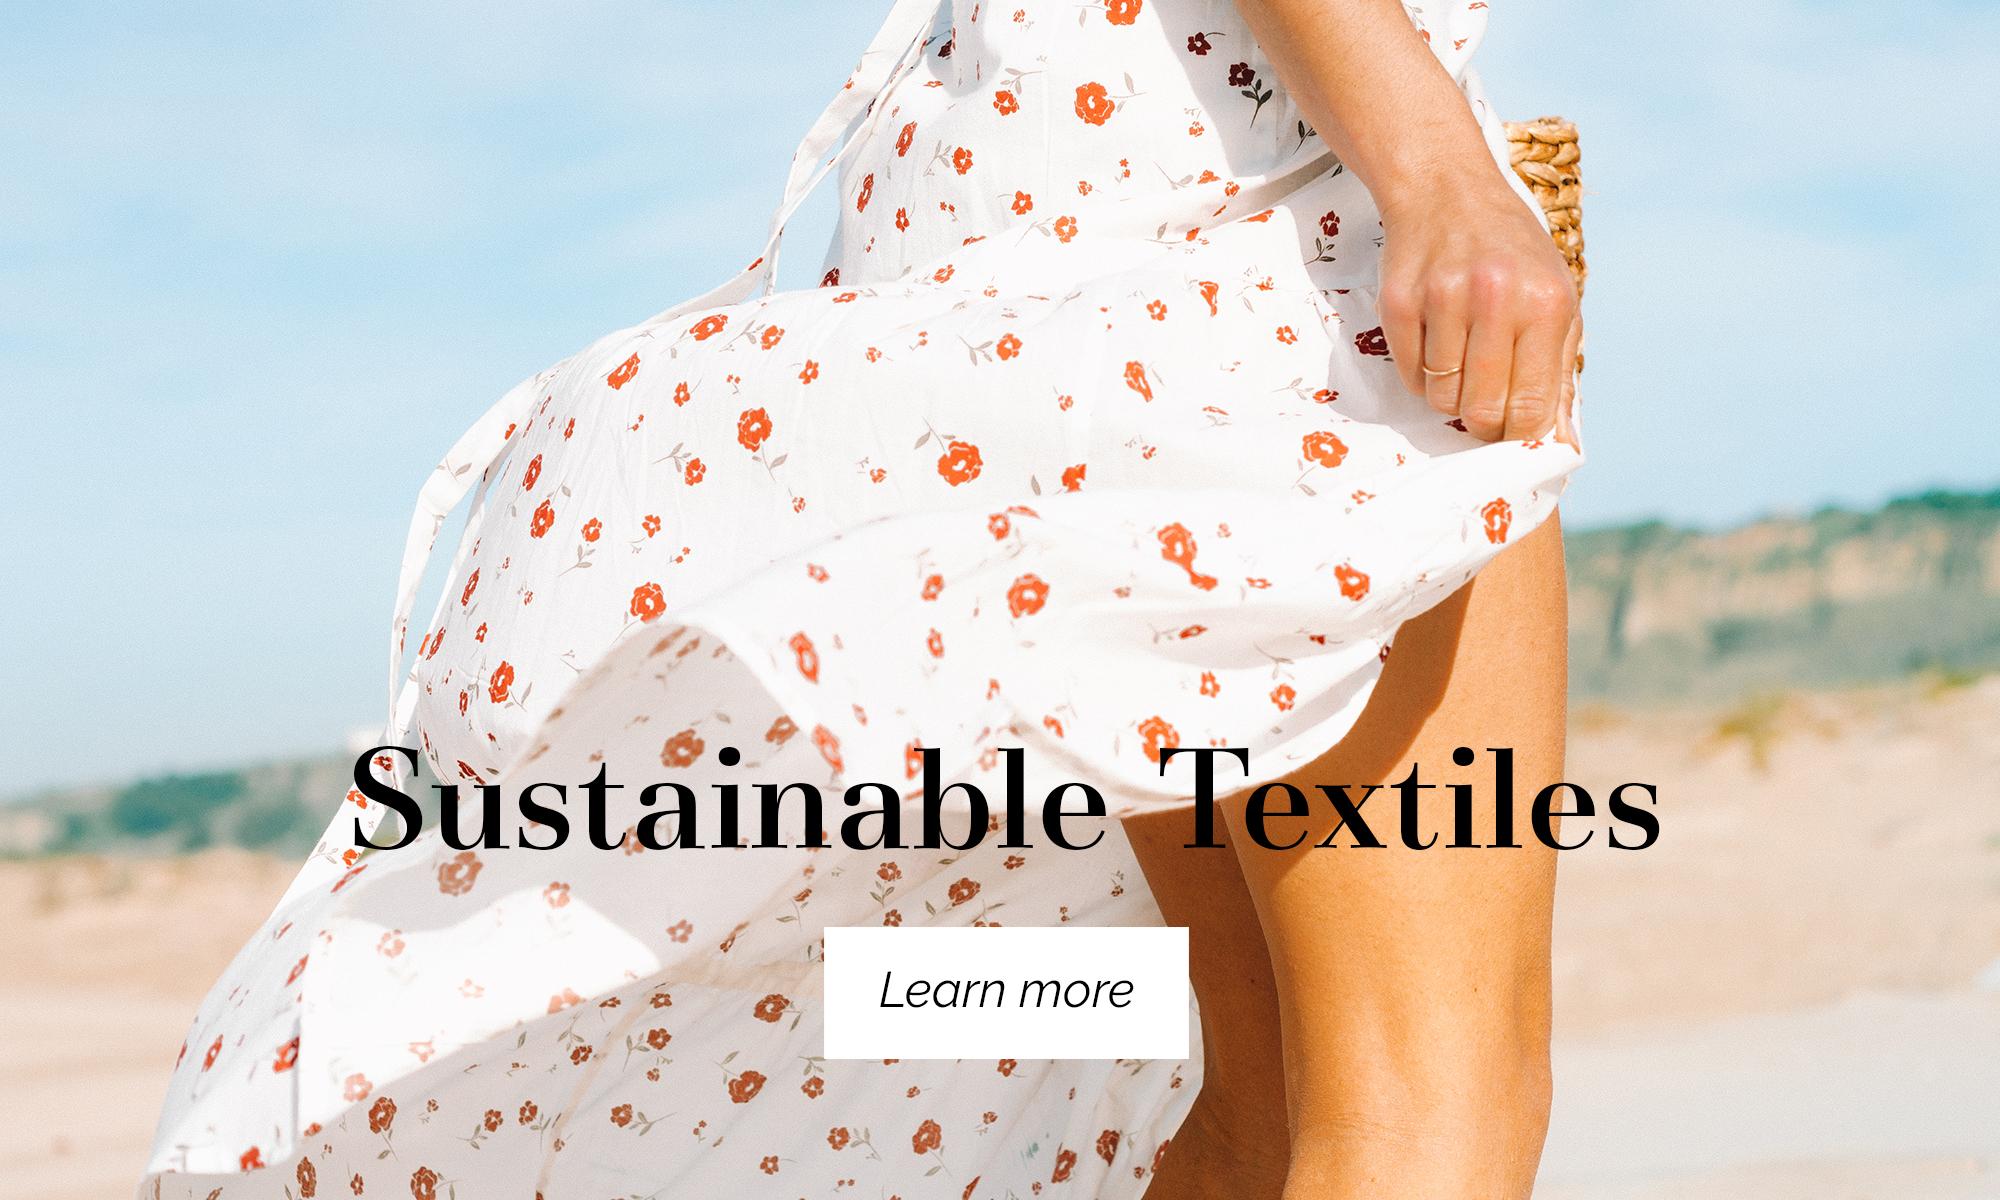 Sustainable Textiles.jpg